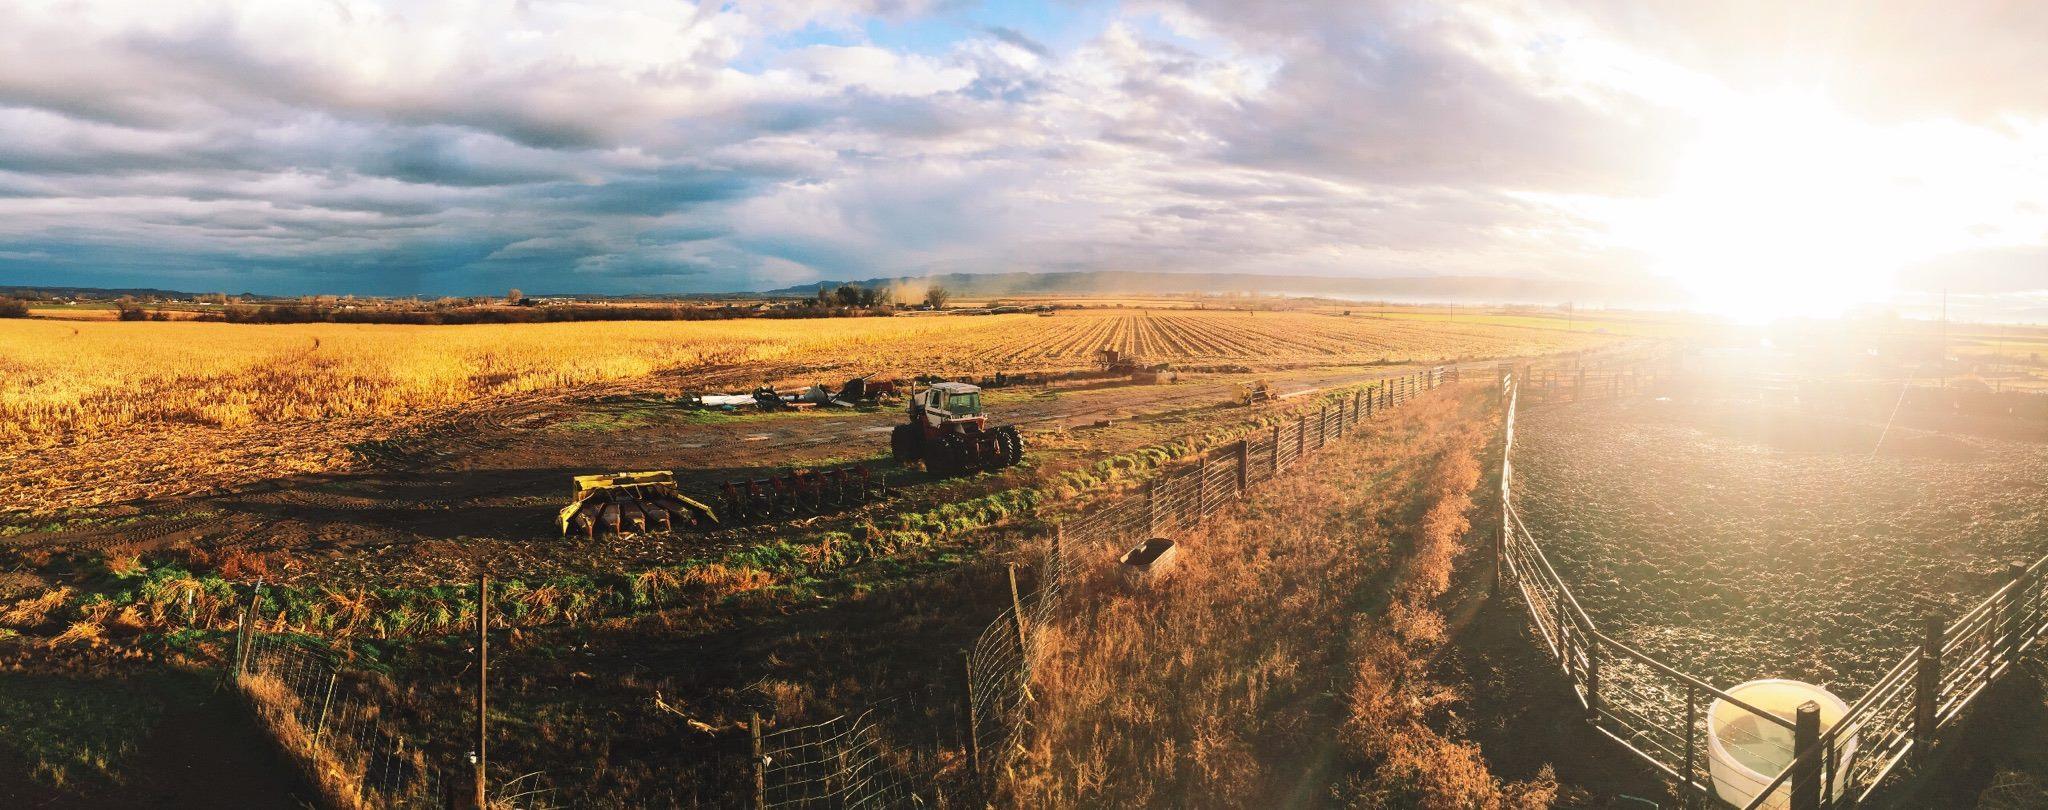 Shenk Livestock and Equipment, farm panorama